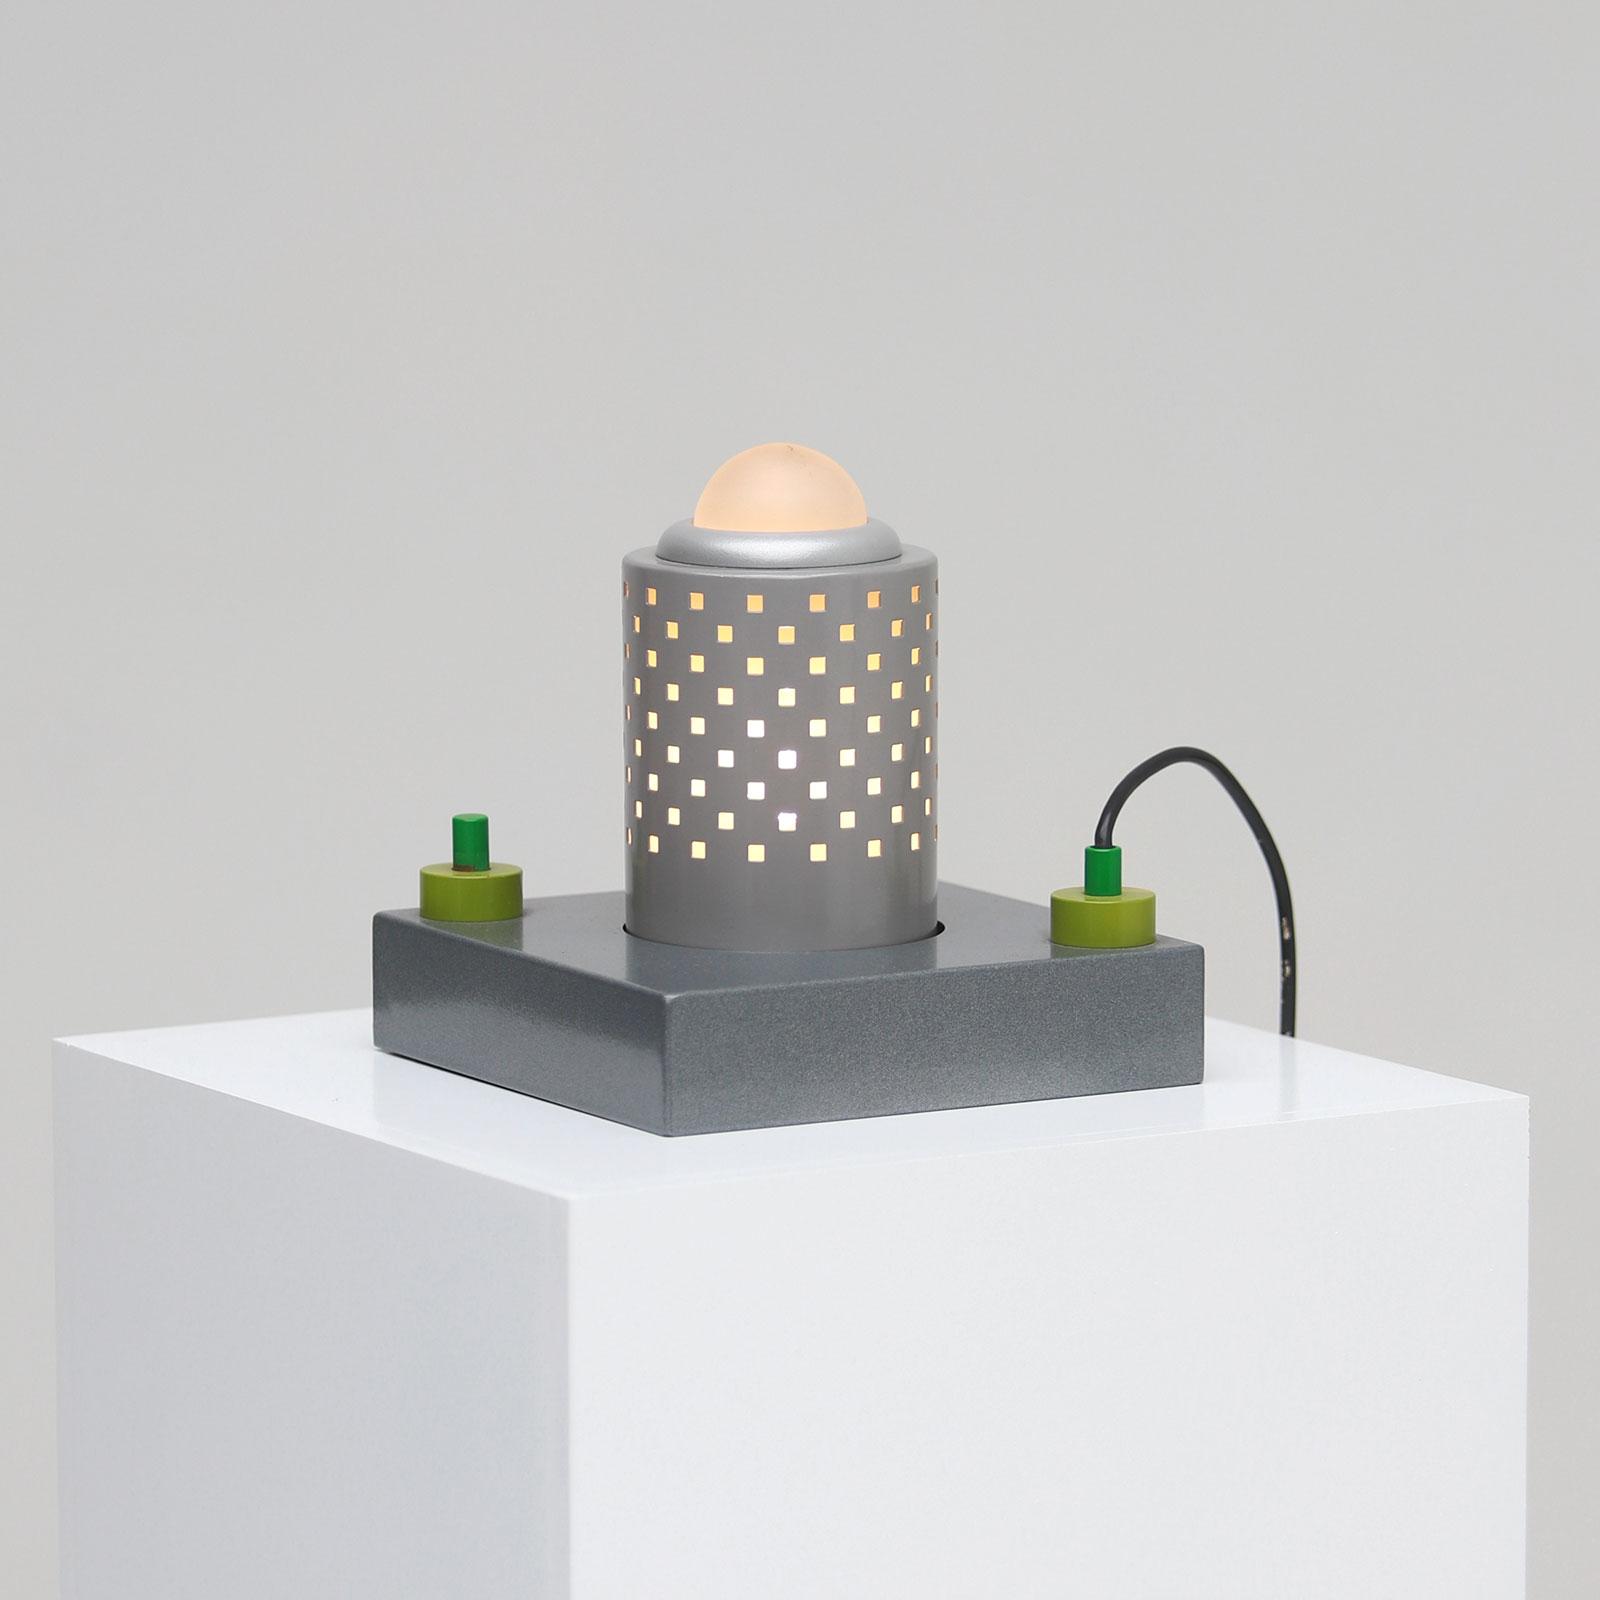 Matteo Thun Dieci Spargi table lamp